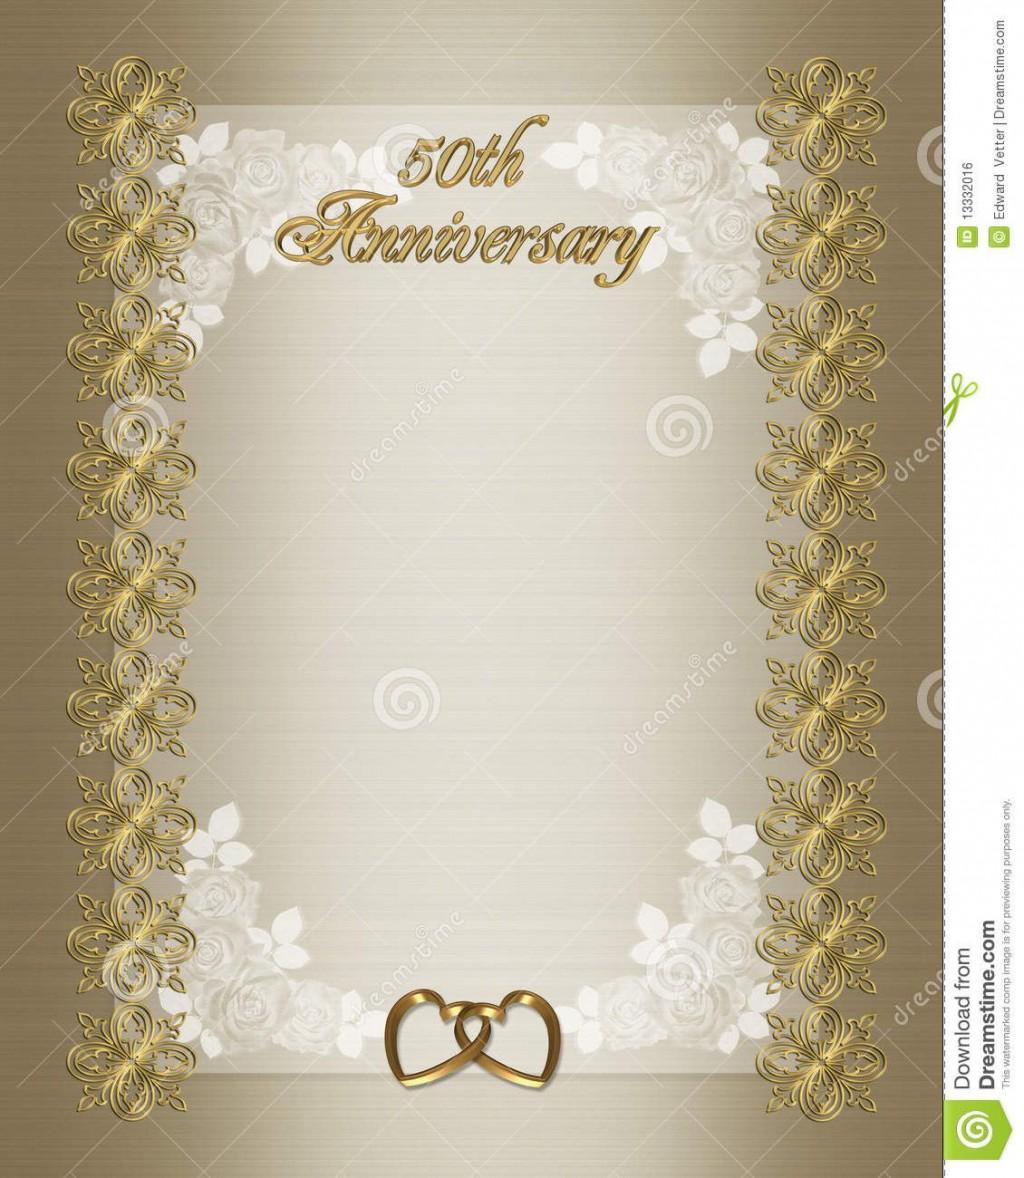 004 Awful 50th Wedding Anniversary Invitation Template Design  Templates Card Sample GoldenLarge